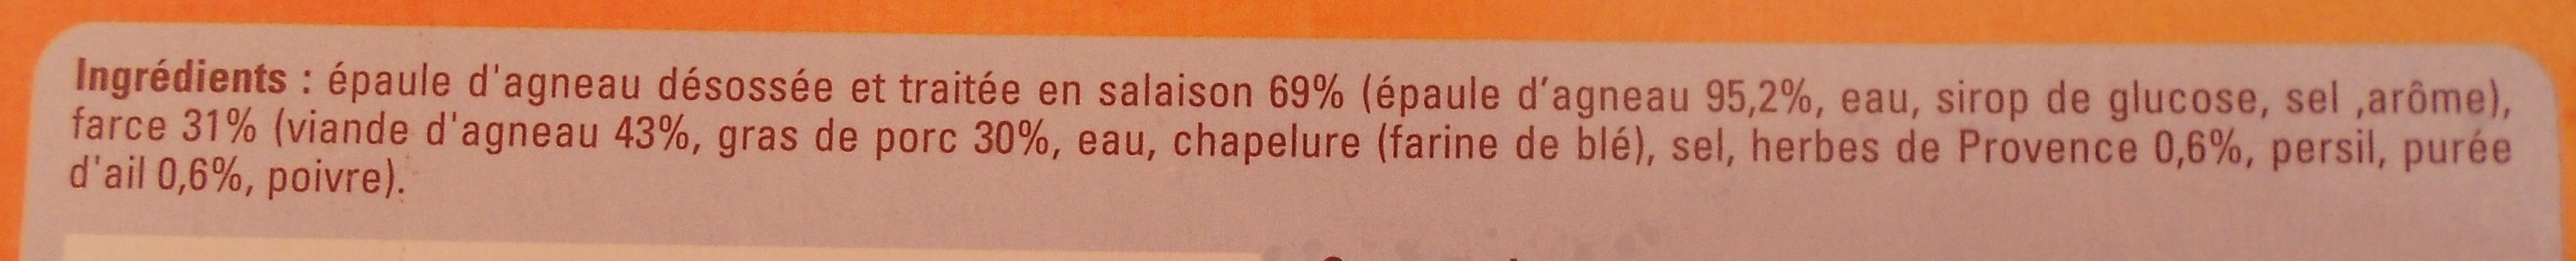 Rôti d'agneau farci, Surgelé - Ingrediënten - fr